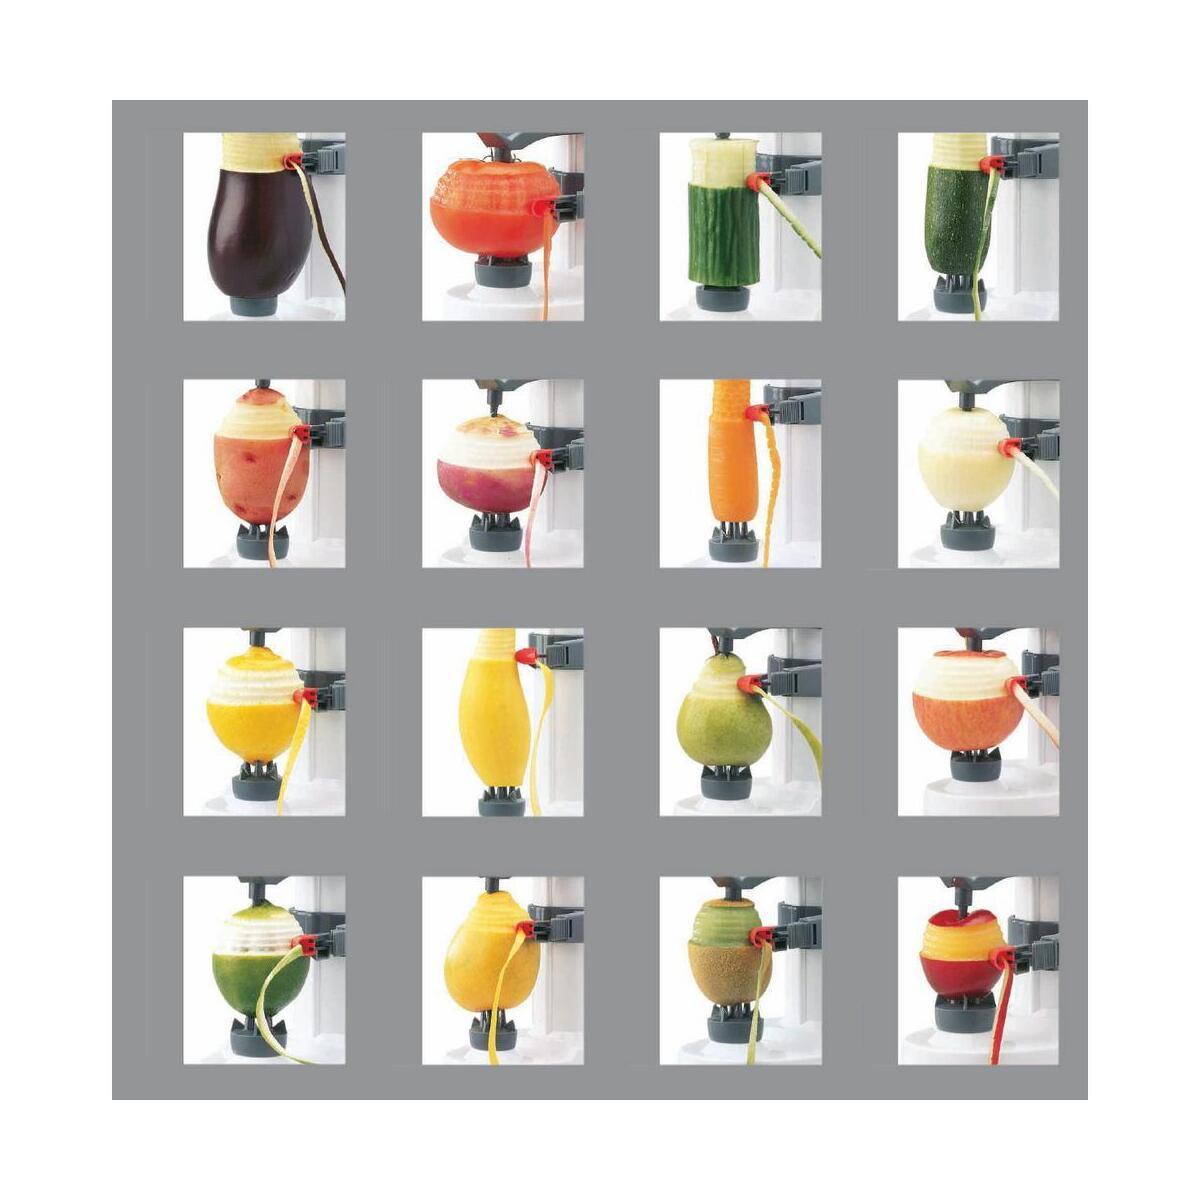 Fruit & Vegetable Peeler